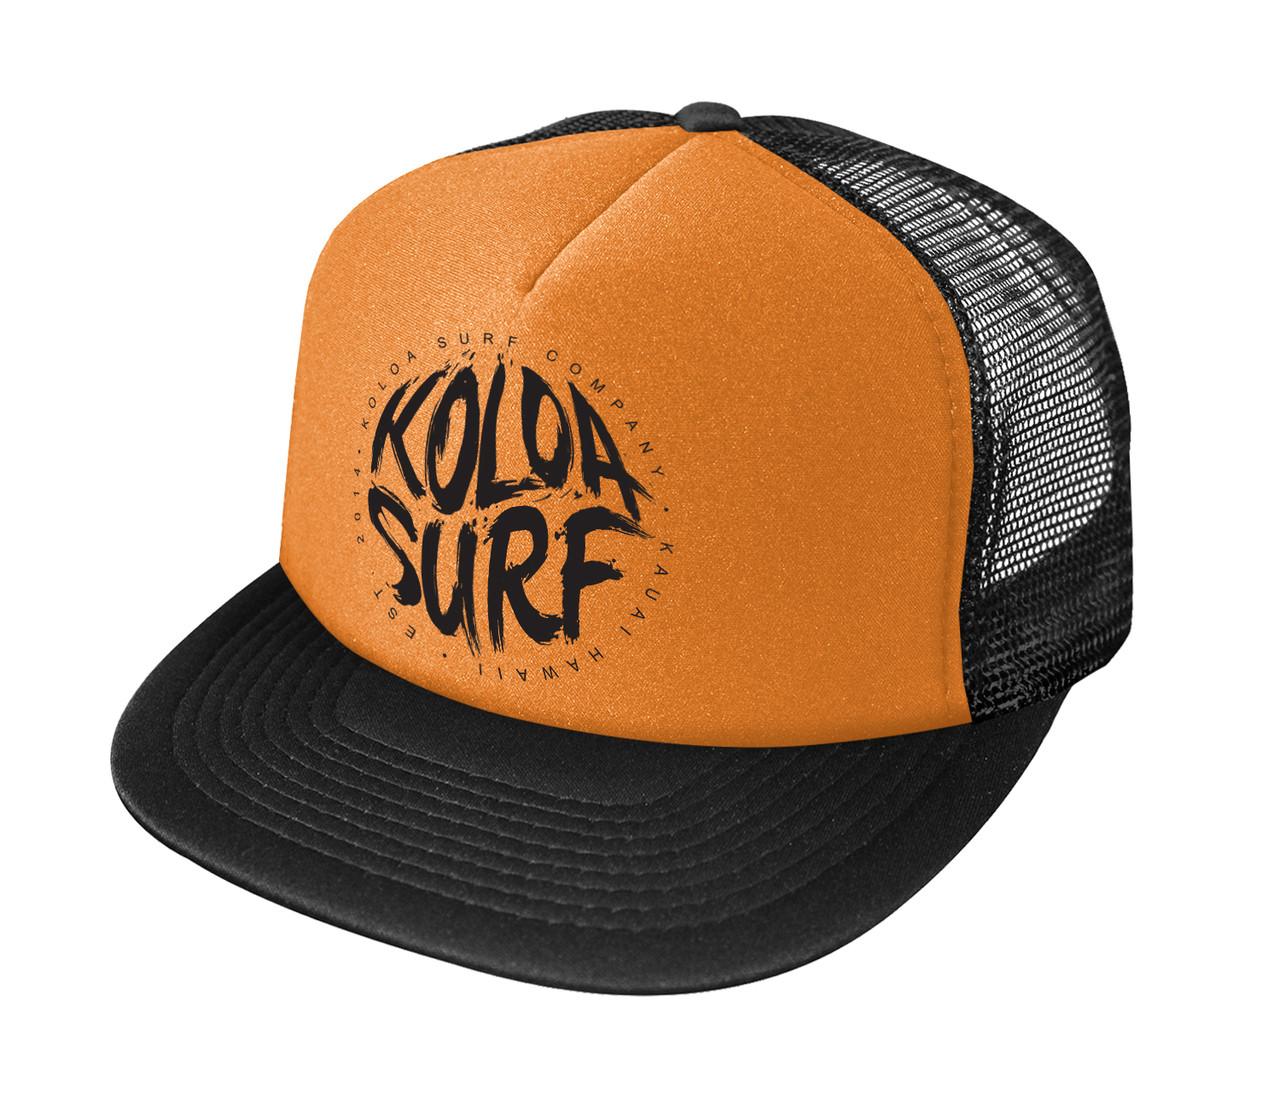 a2e5809aad1 ... Printed Logo Poly-Foam Mesh Snapback High Profile Trucker Hats Neon  Orange   Black logo. Neon Orange   Black logo